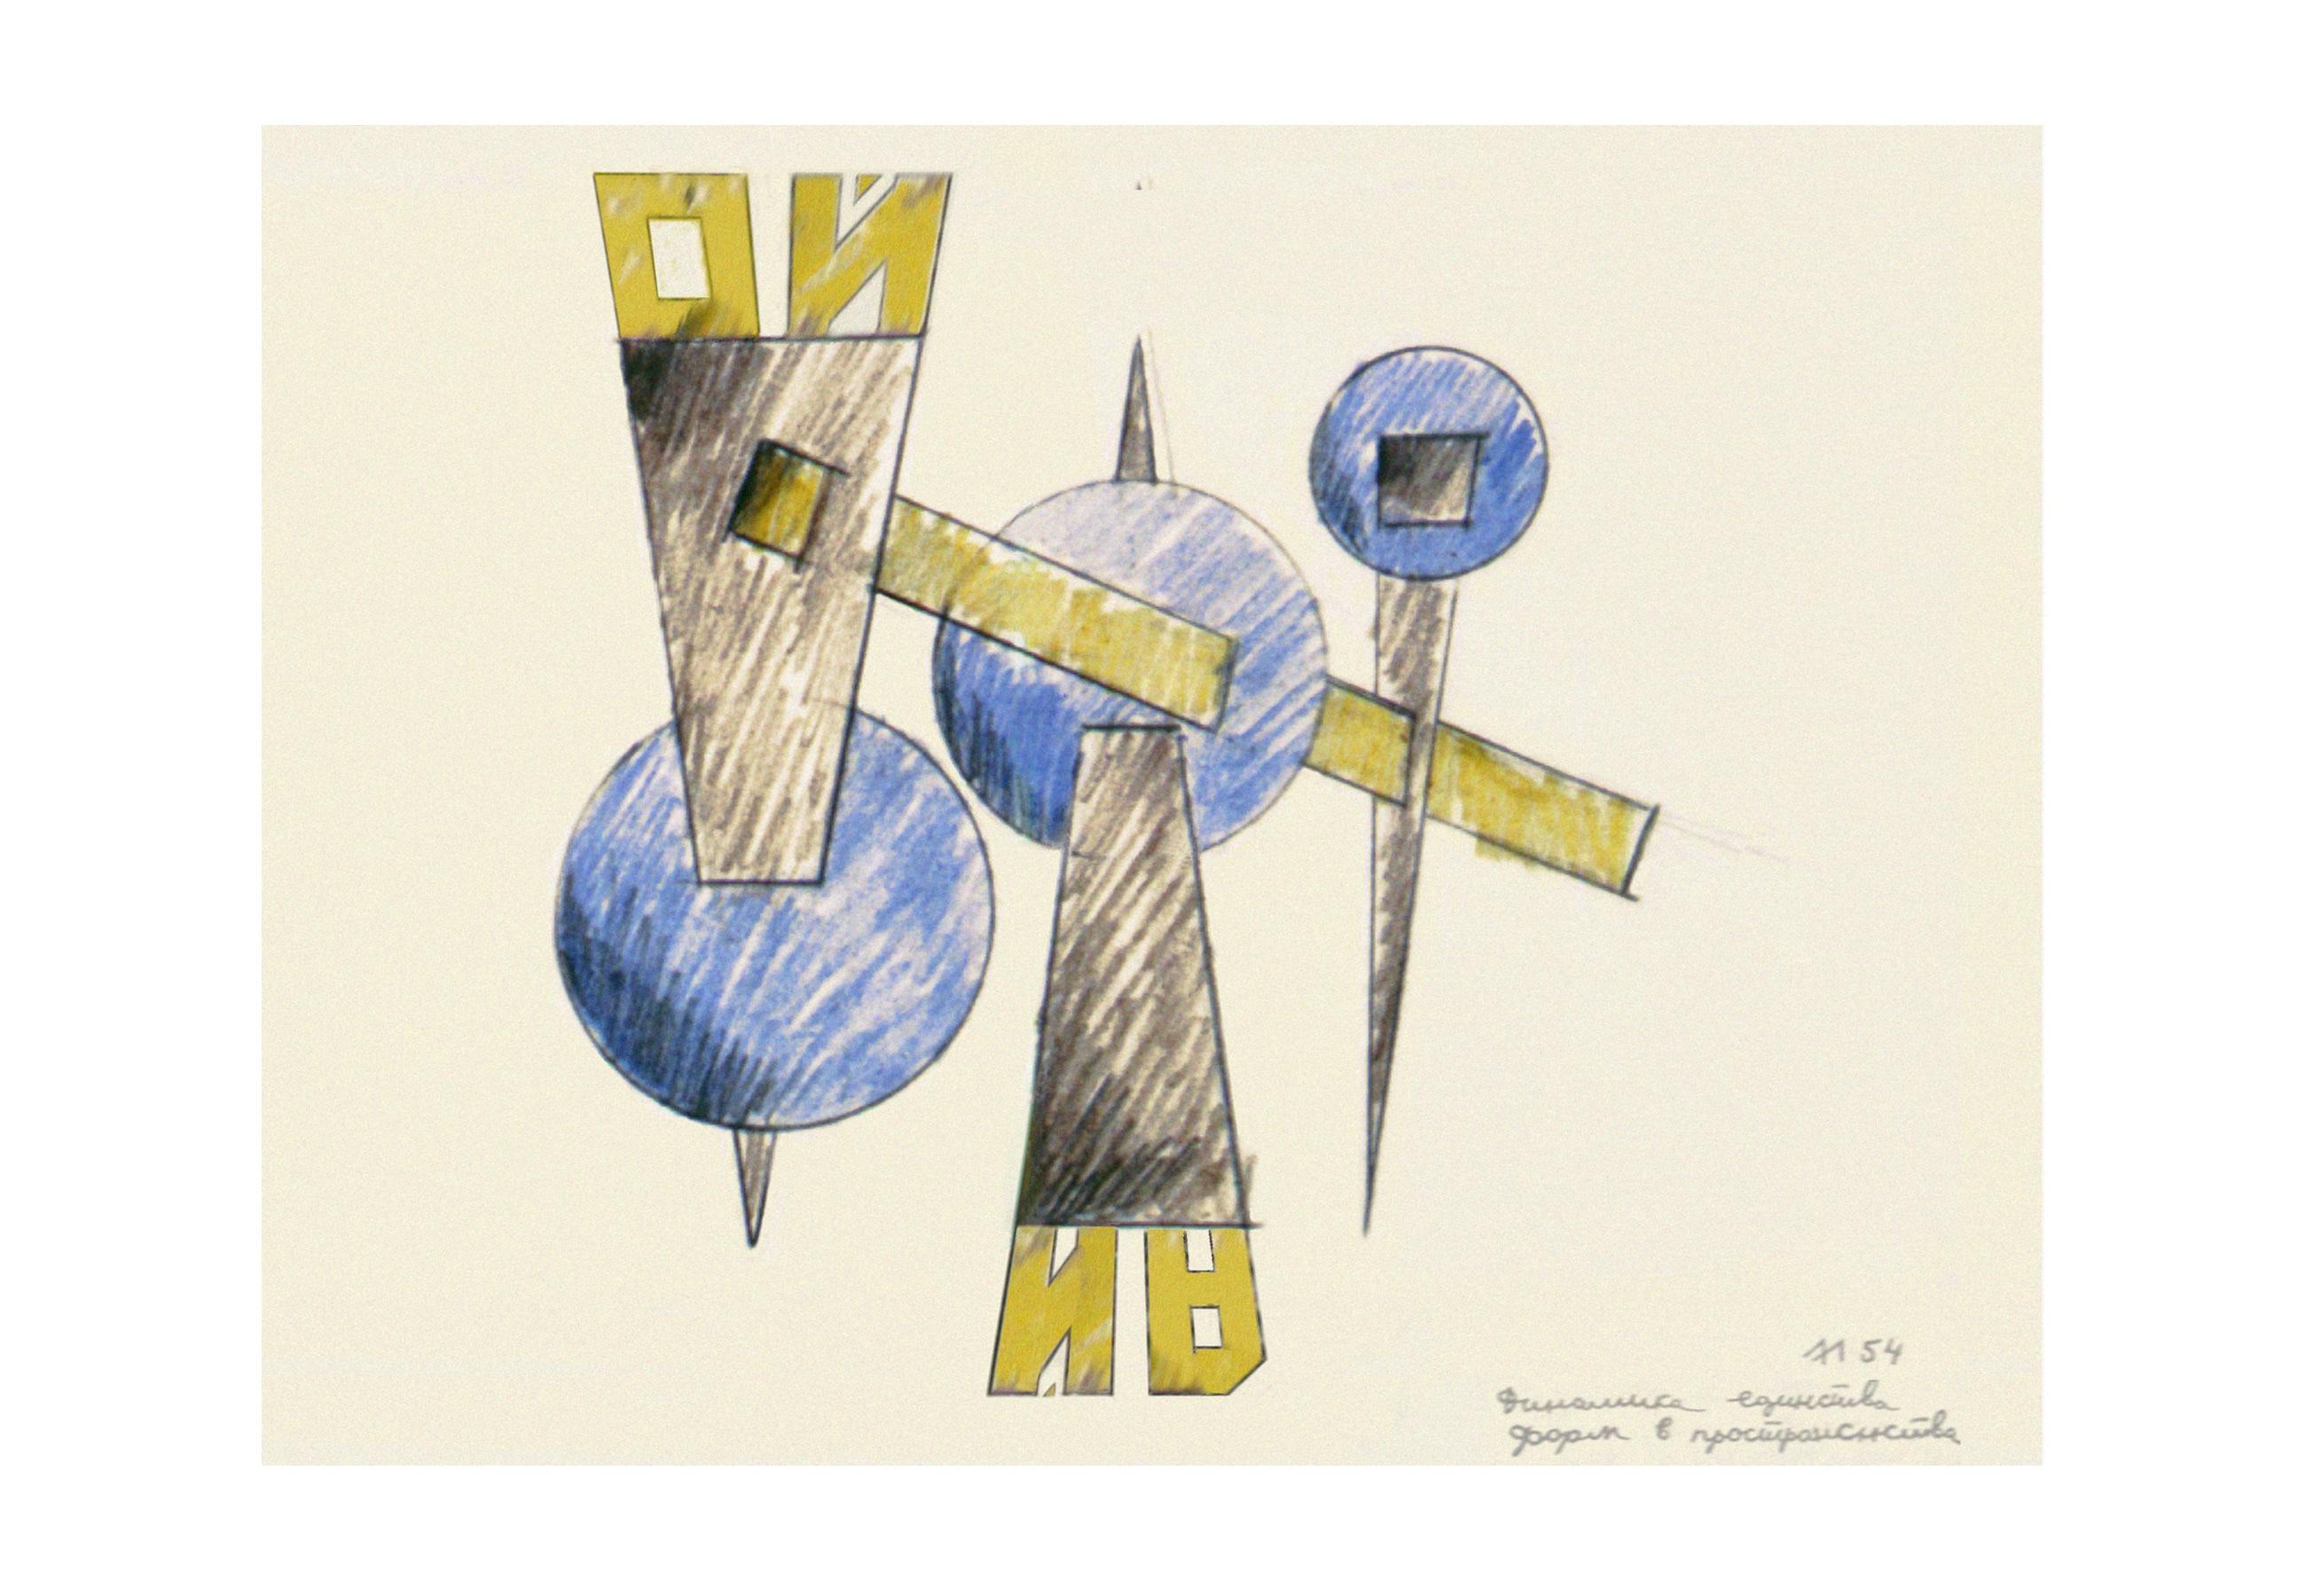 Lamm-Portfolio-1954-1955-12.jpg